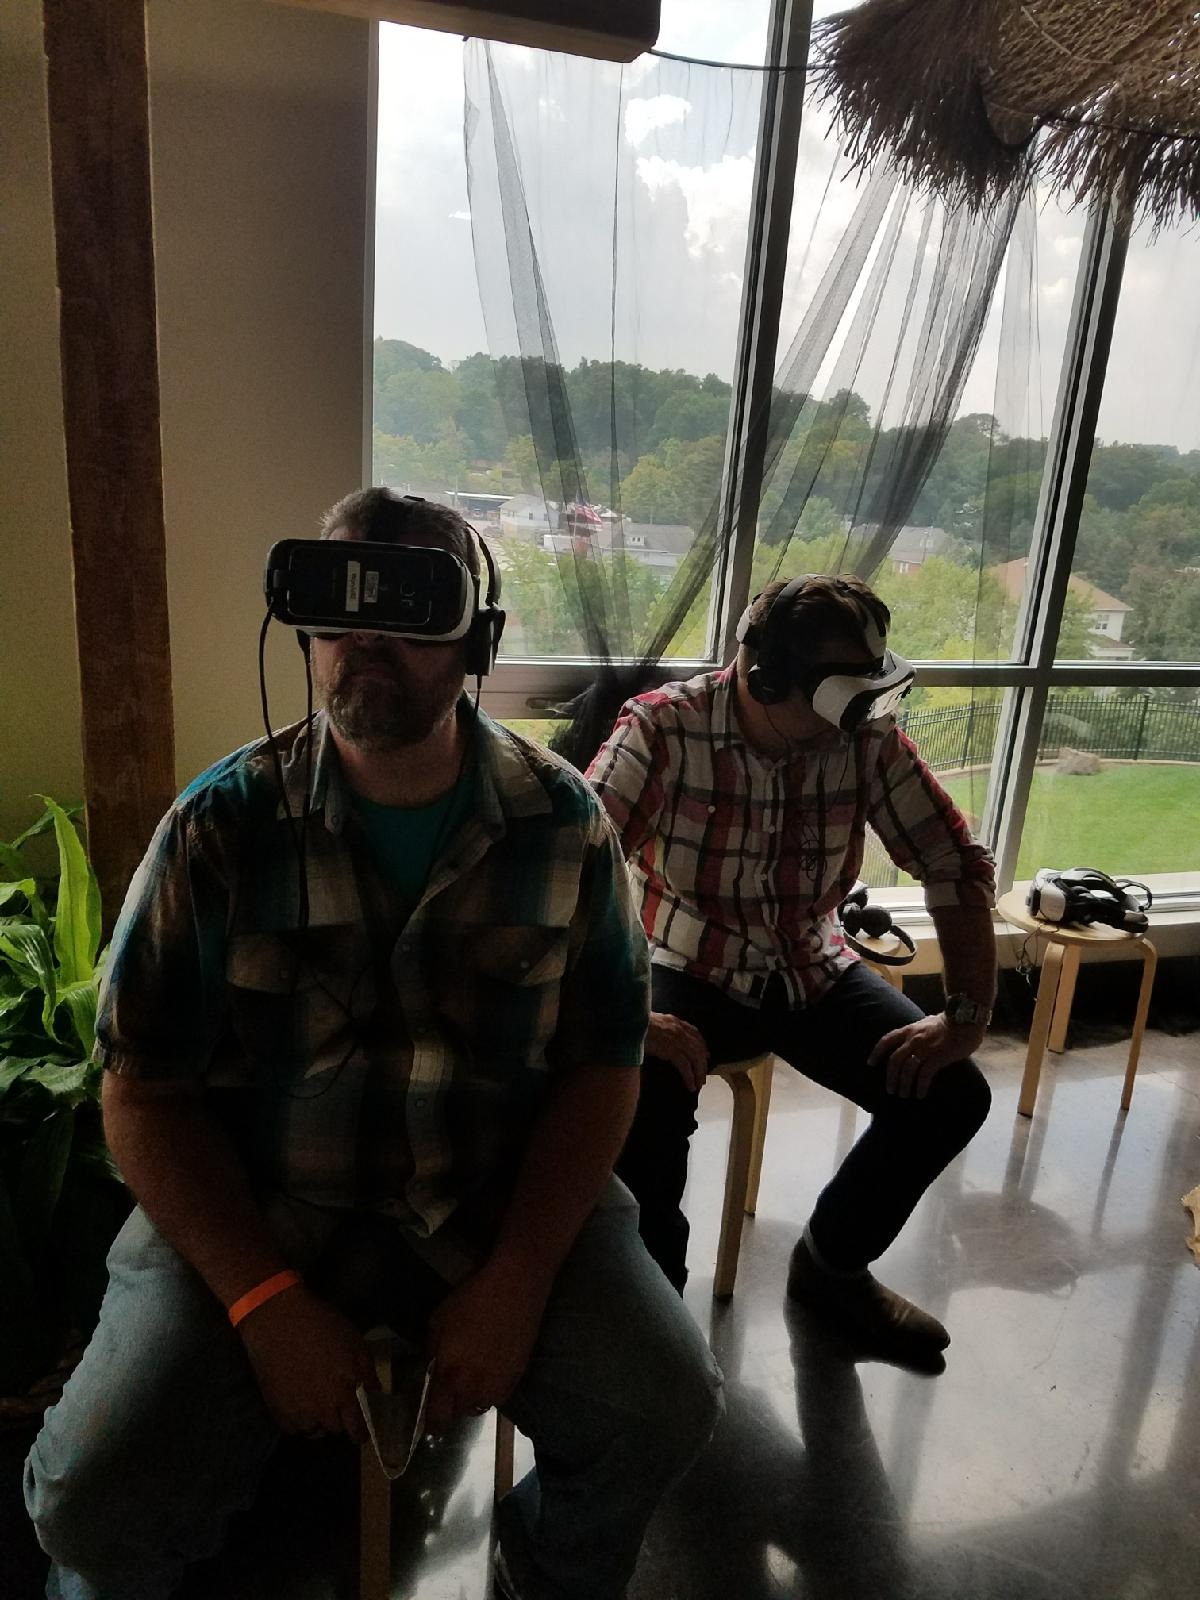 me and tim lucas virtual reality